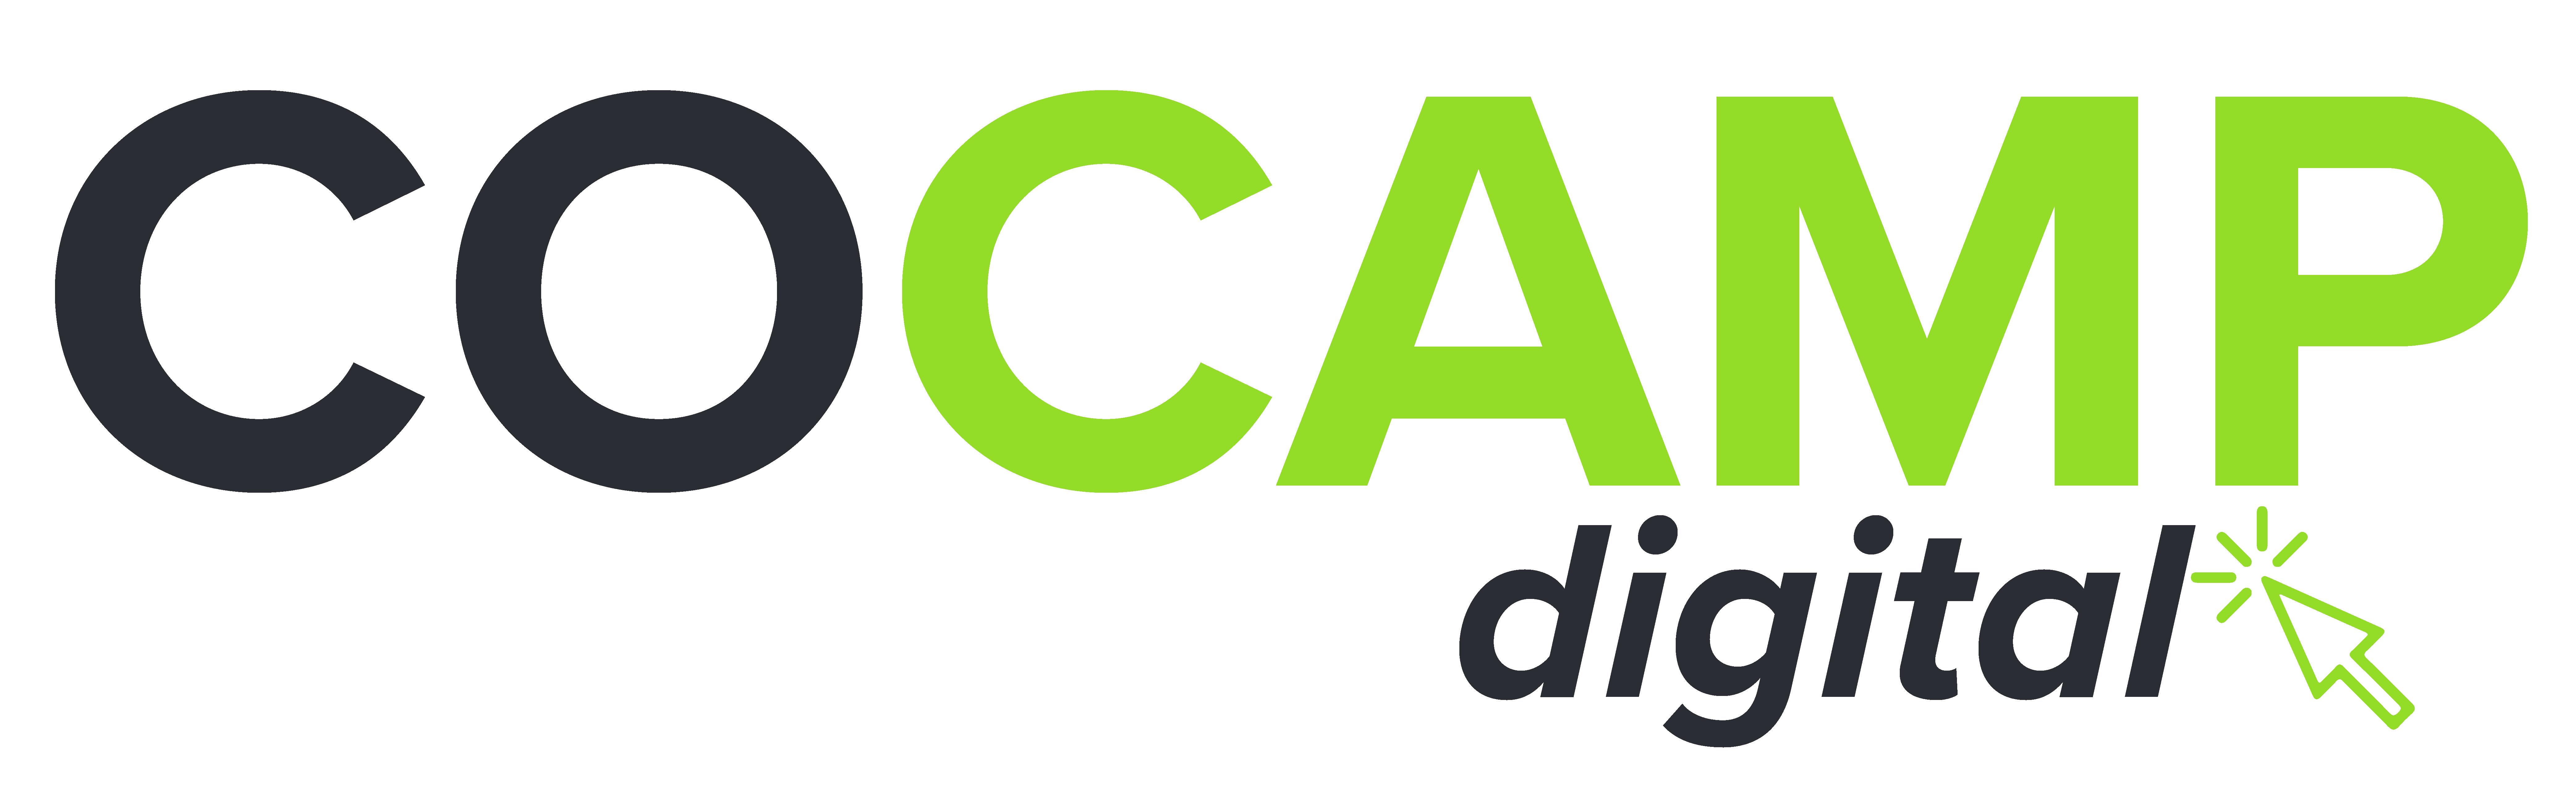 CoCamp Digital